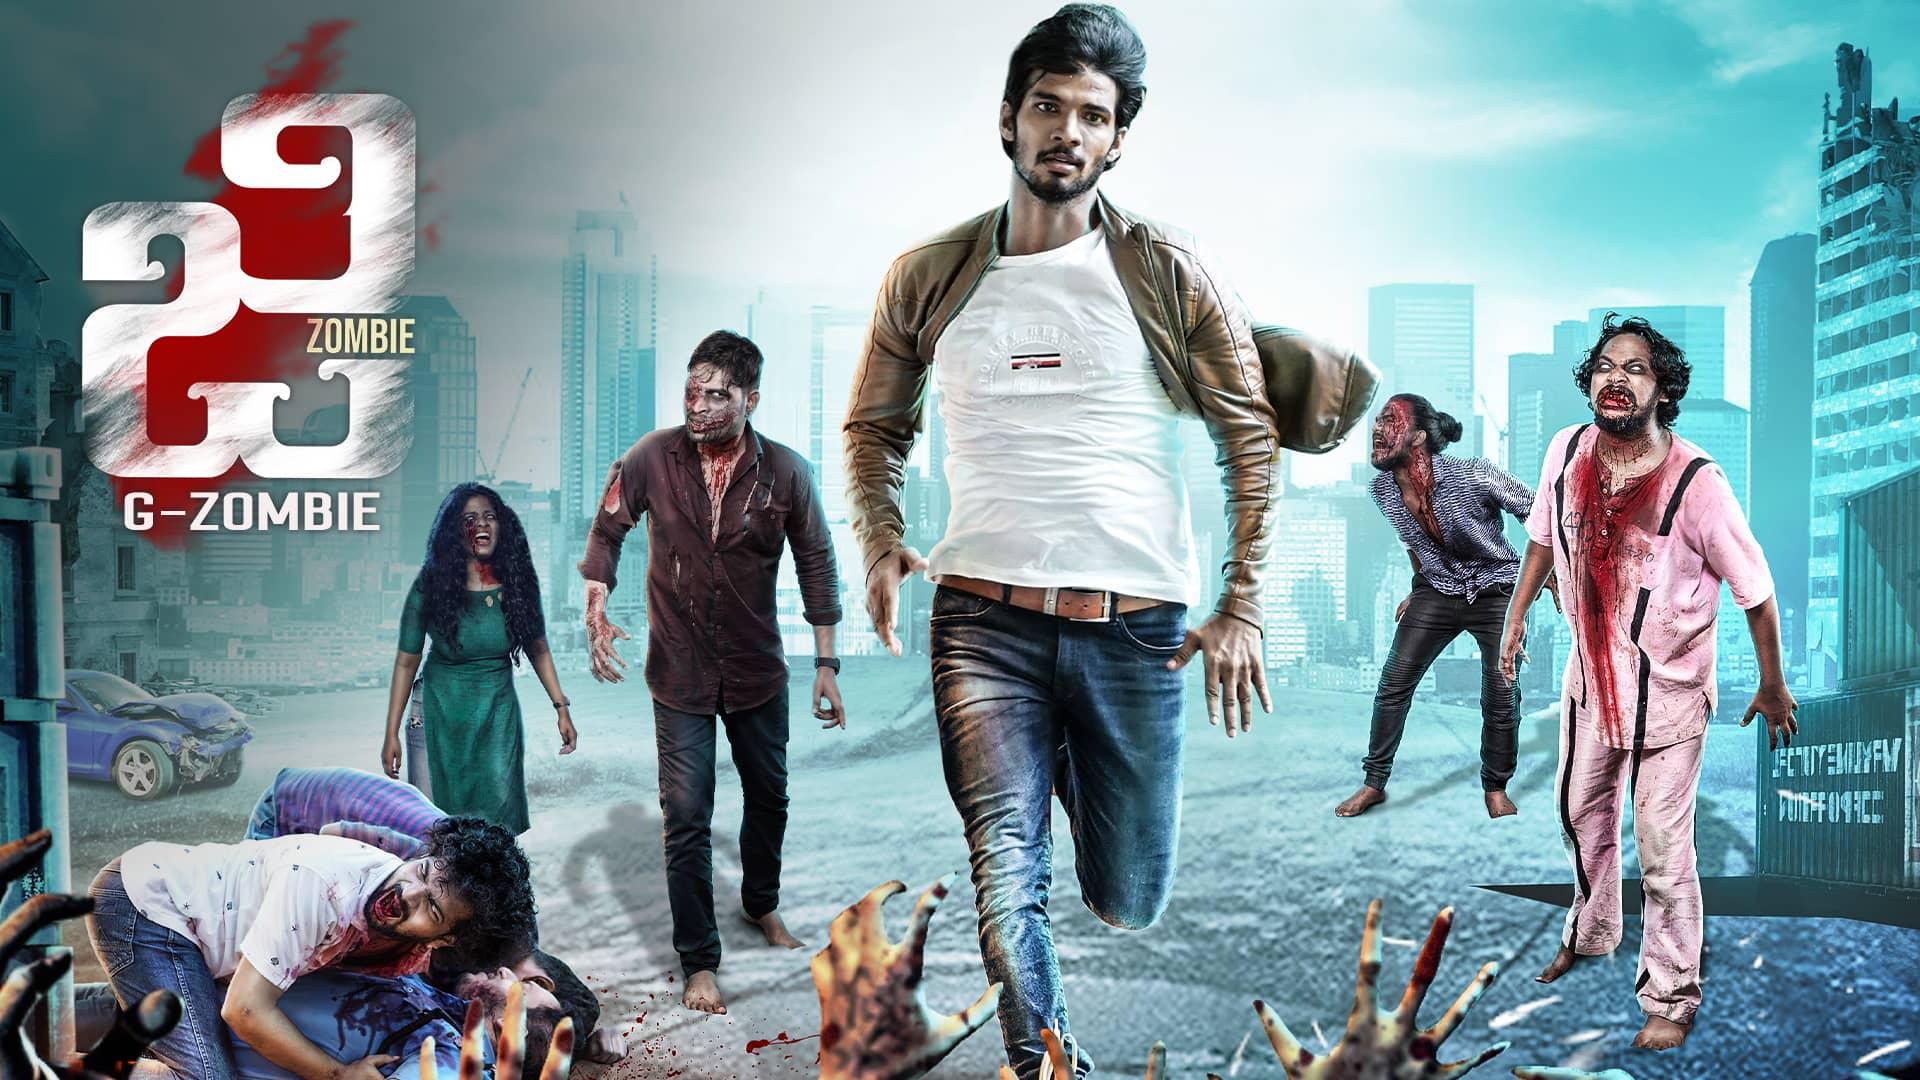 G-Zombie movie